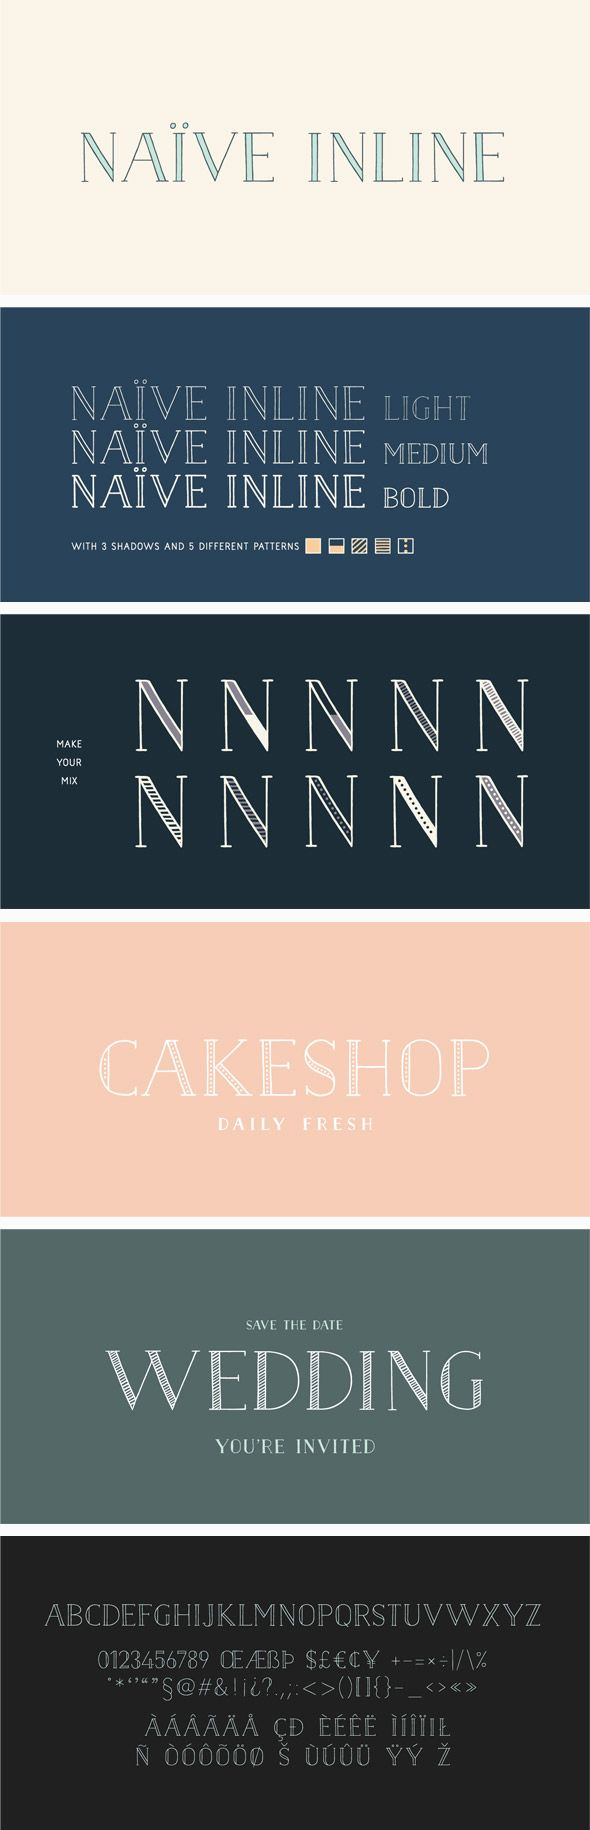 Download Naive Inline Font Pack | Font packs, Graphic design fonts ...